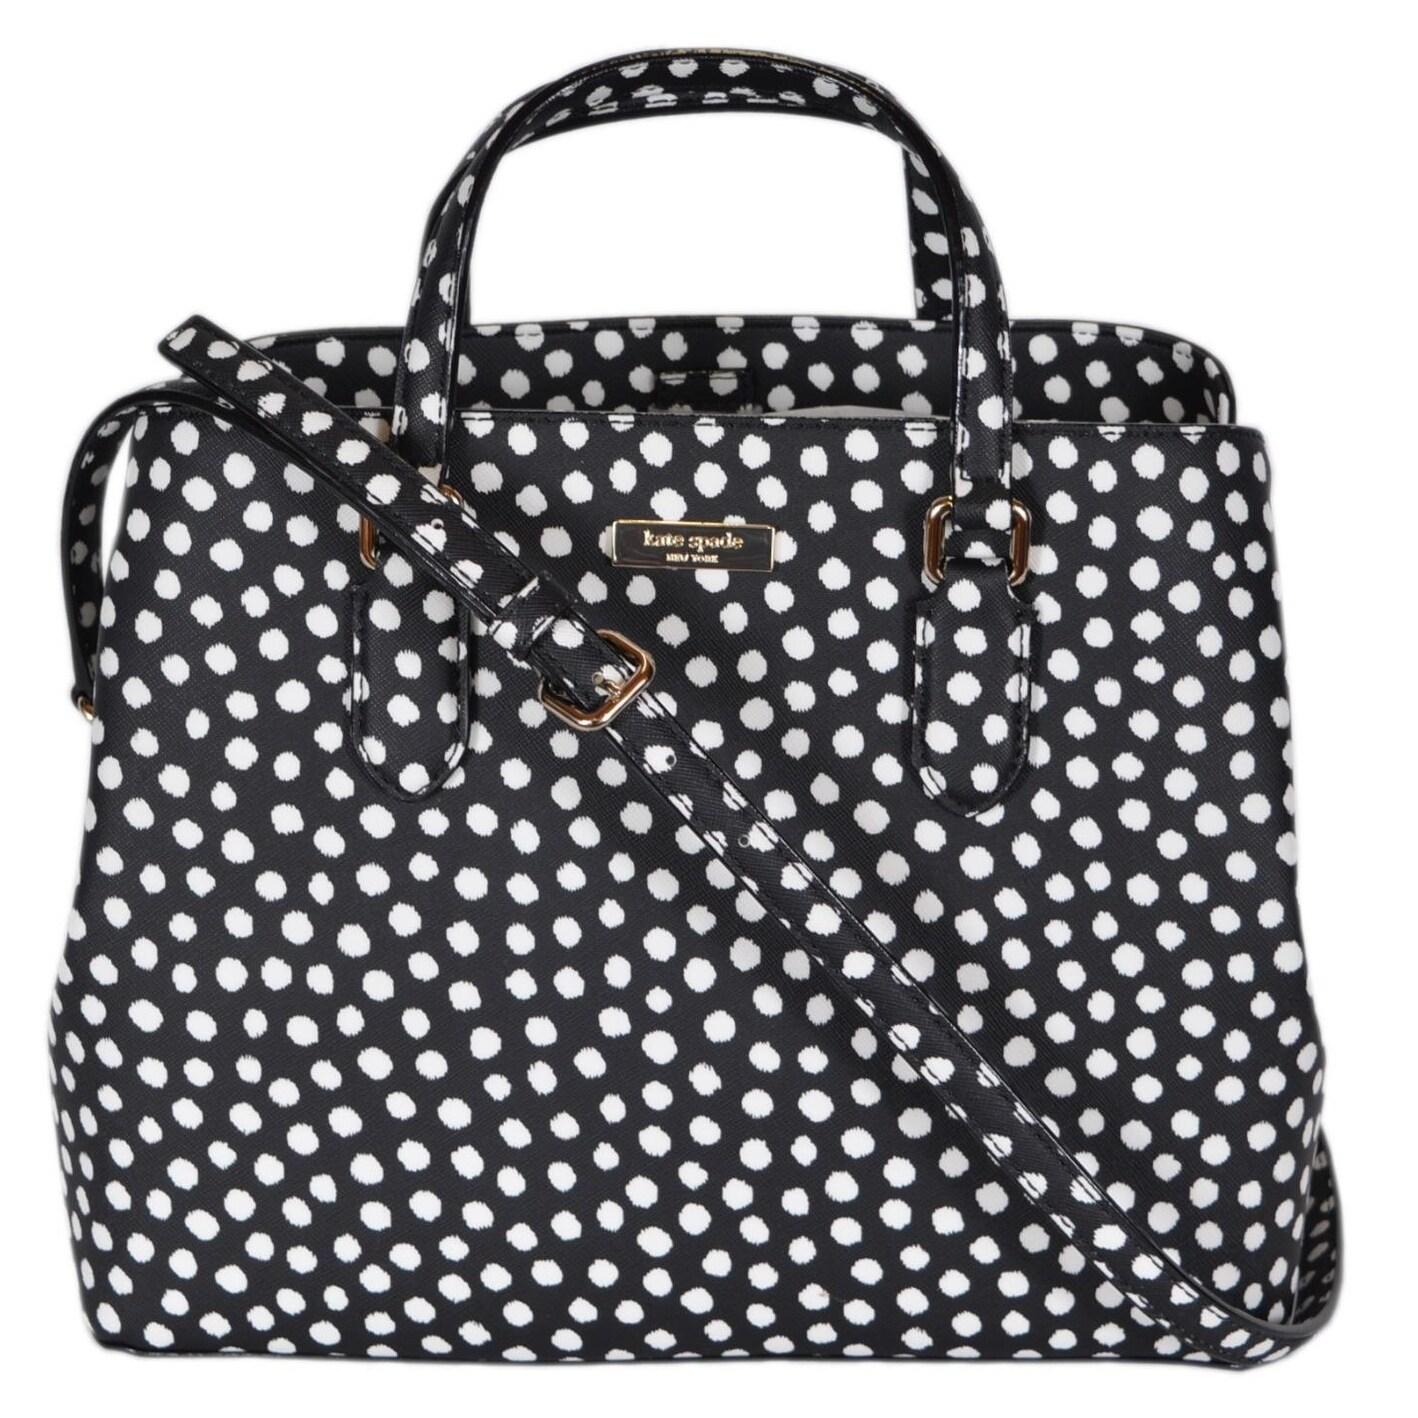 Kate Spade Musical Dot Laurel Way Medium Evangelie Handbag Purse 12 X 9 5 On Free Shipping Today 21176404